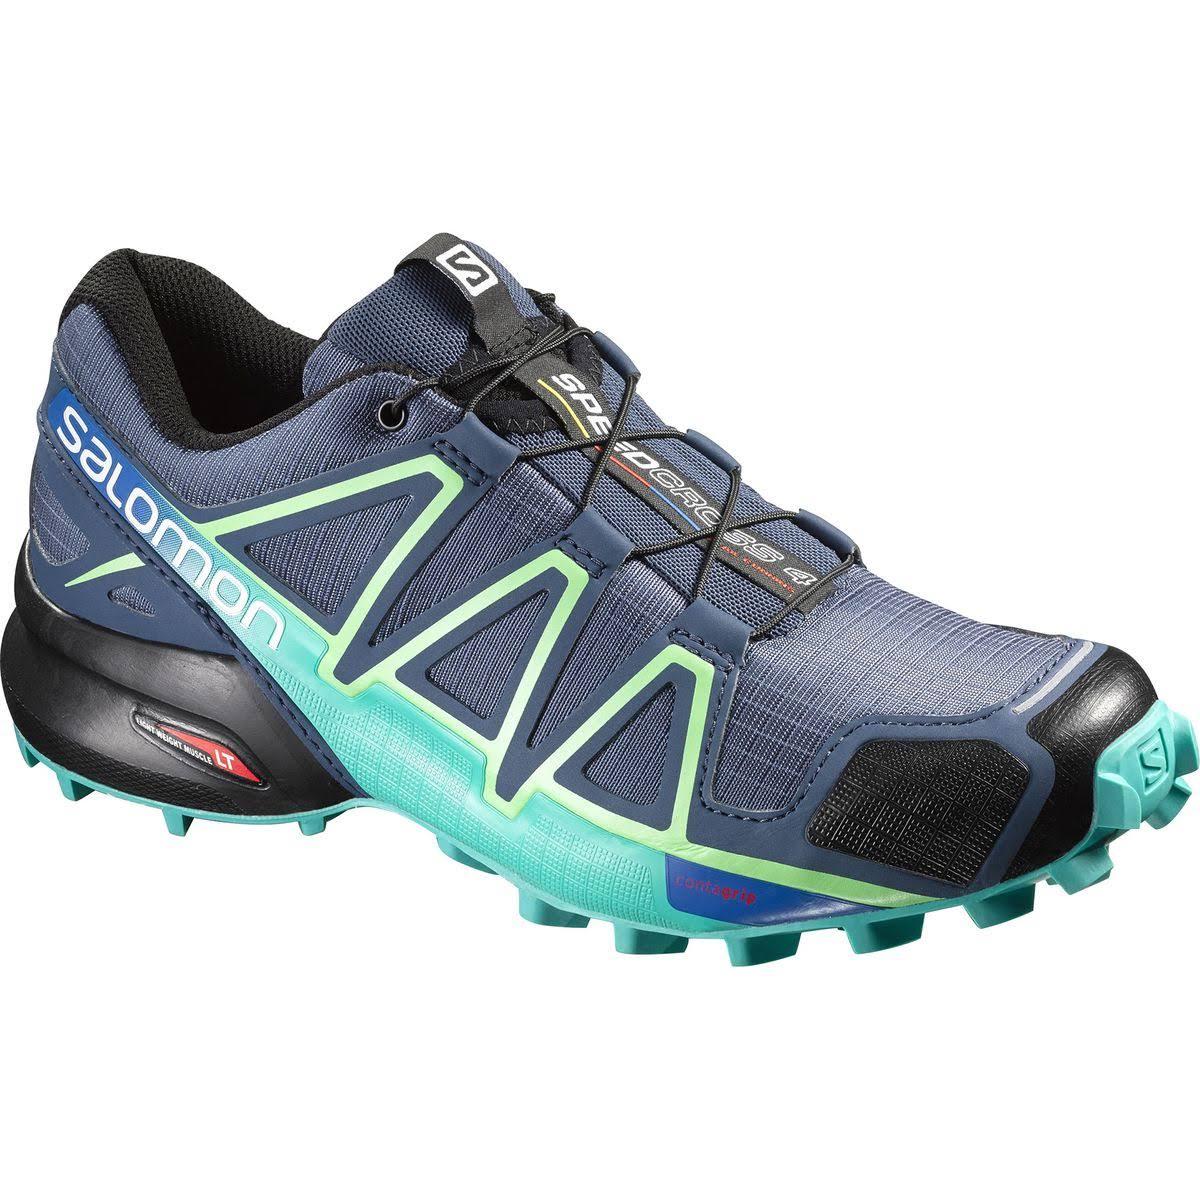 Salomon 4 Calzado Speedcross De Running 2016 Para Trail 17 L38310400 Mujer U87xUwr